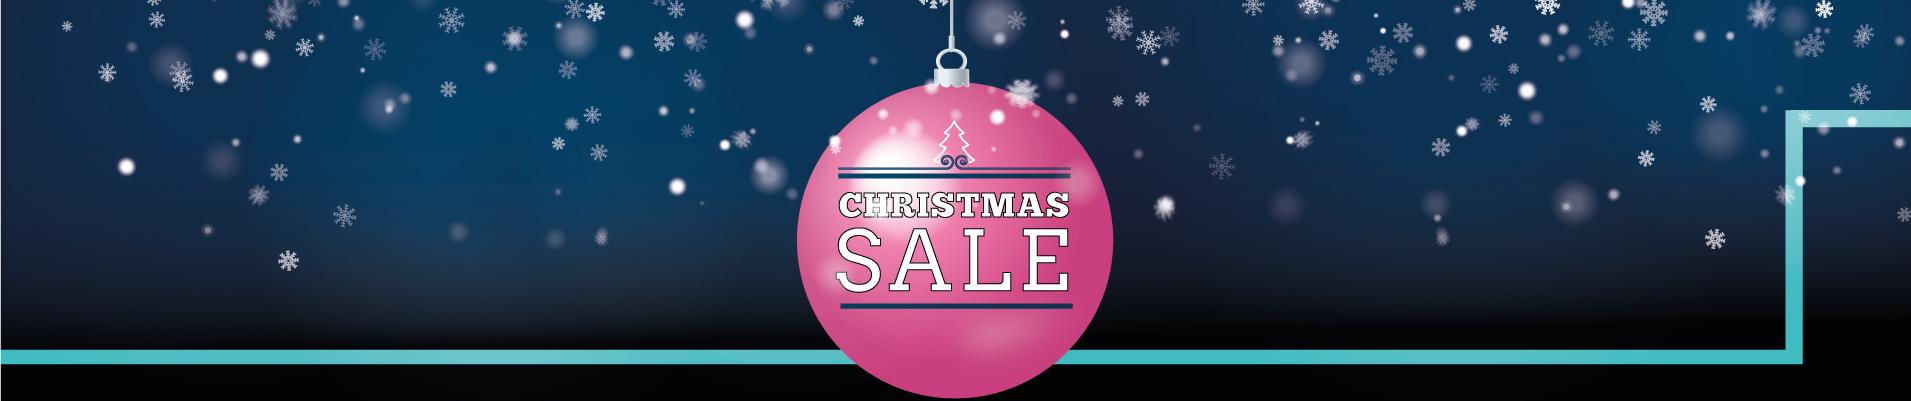 Christmas-Sale-hero3